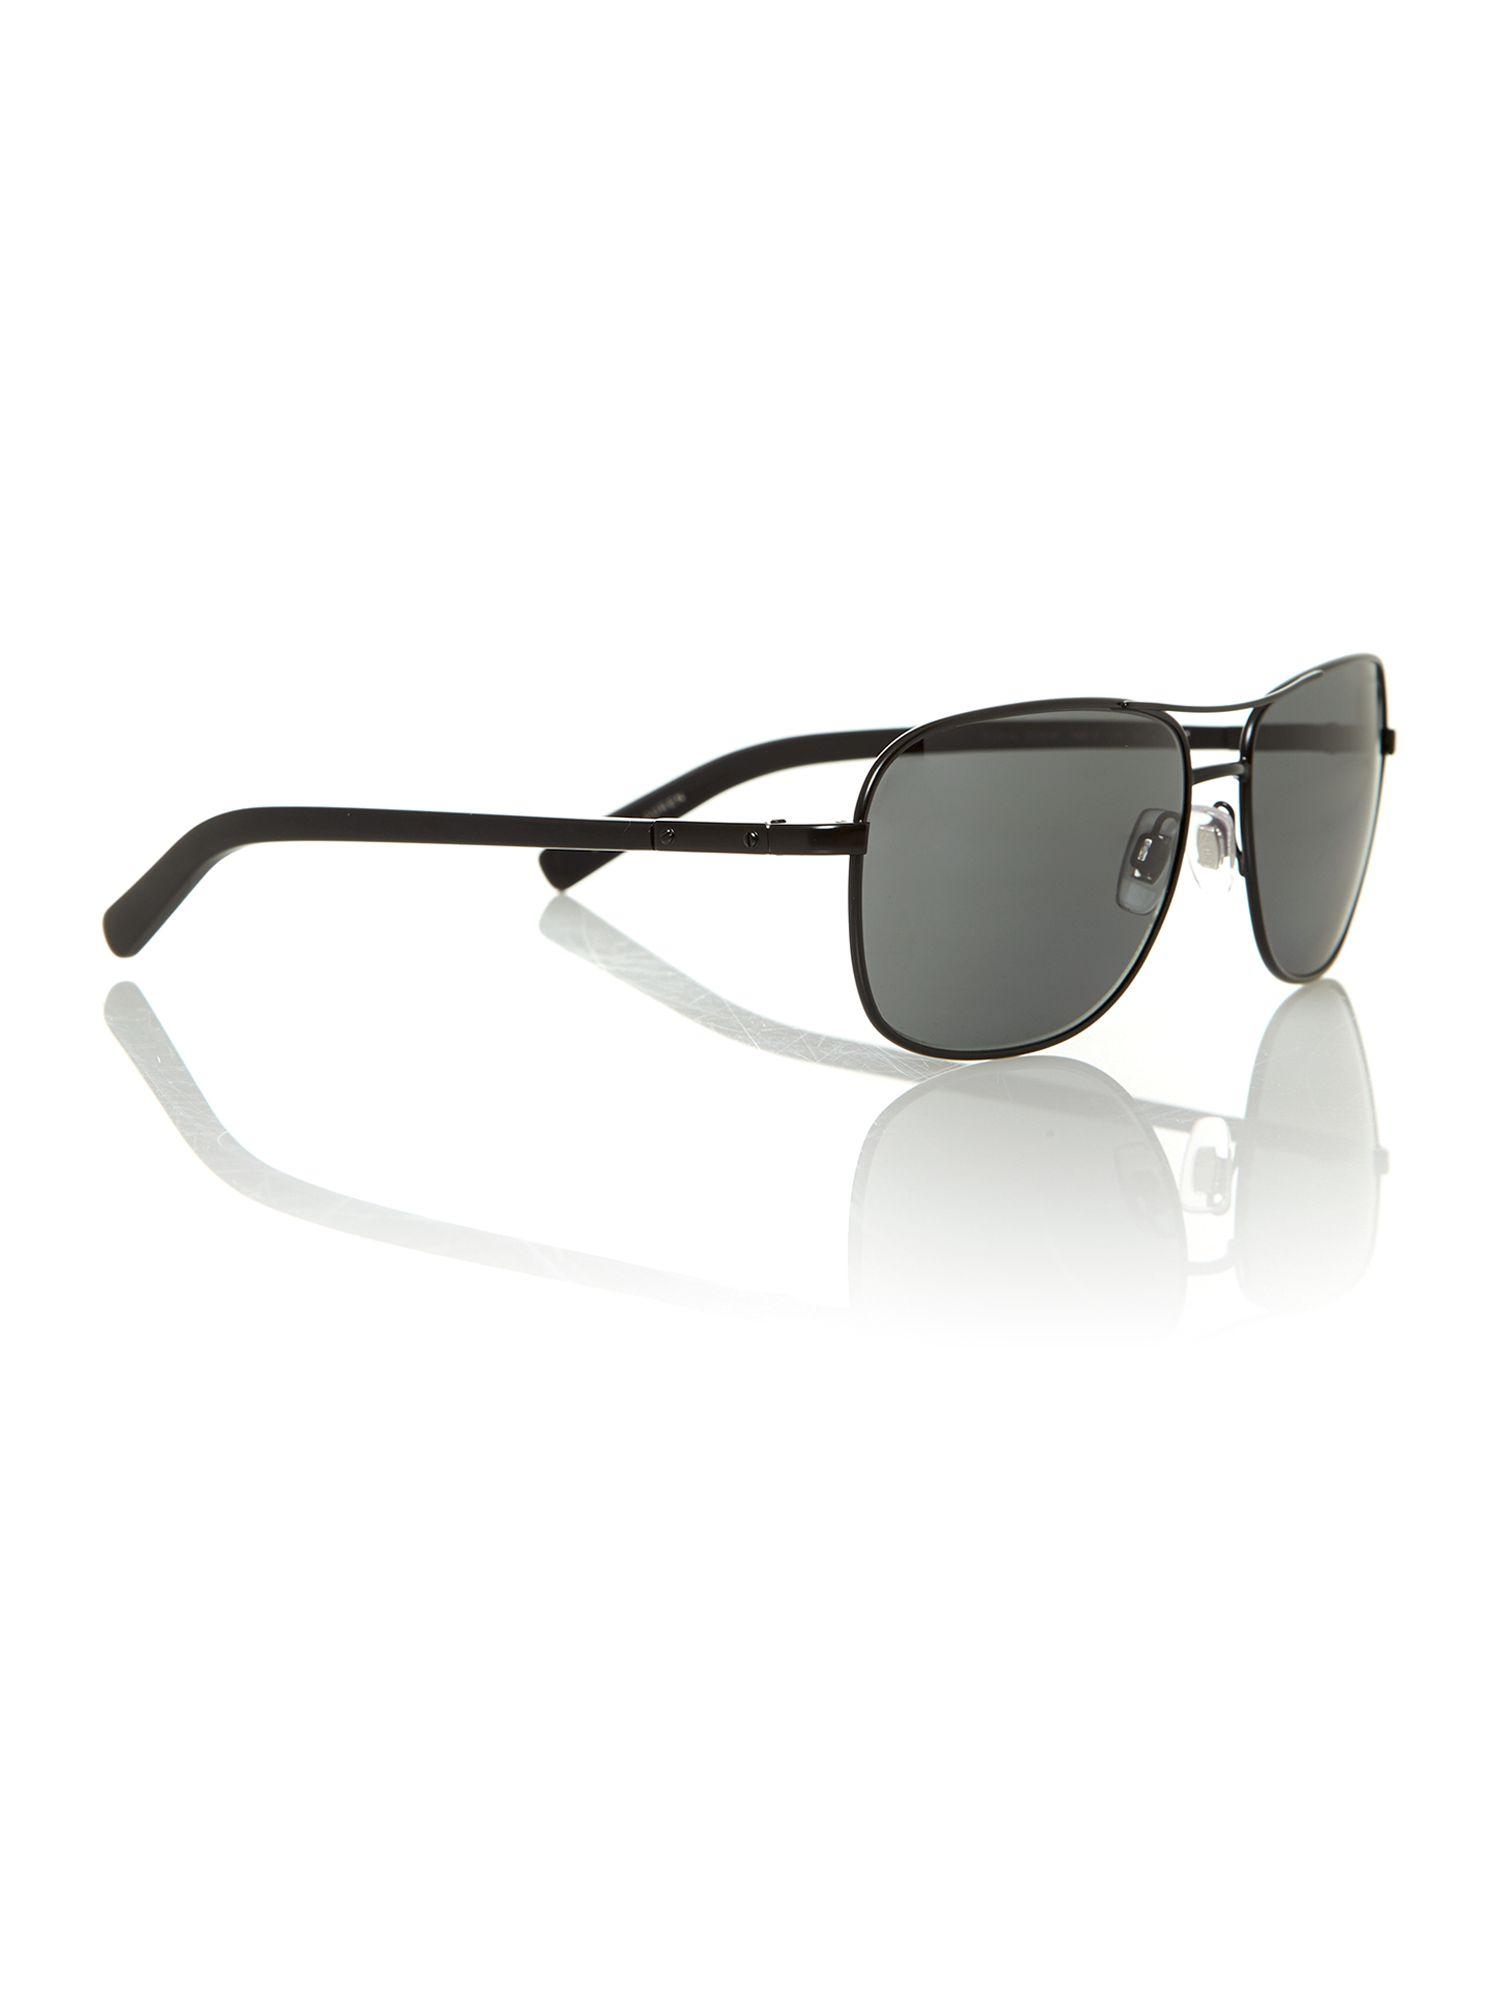 Polo Ralph Lauren Men S Glasses David Simchi Levi